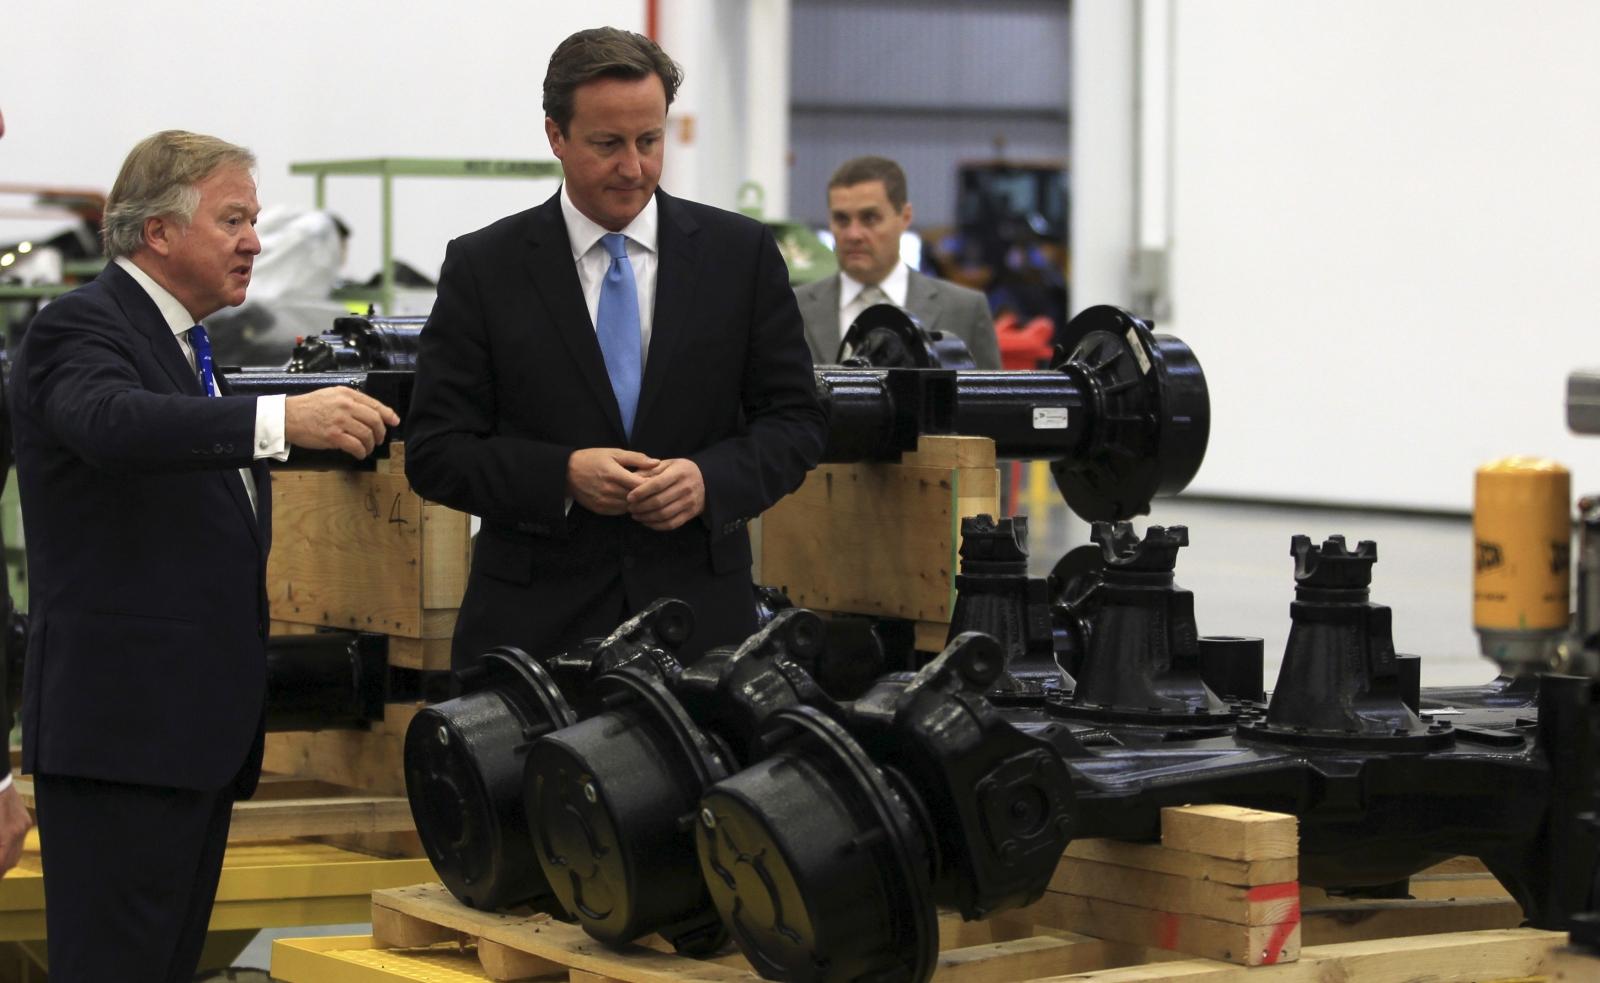 Lord Bamford and David Cameron